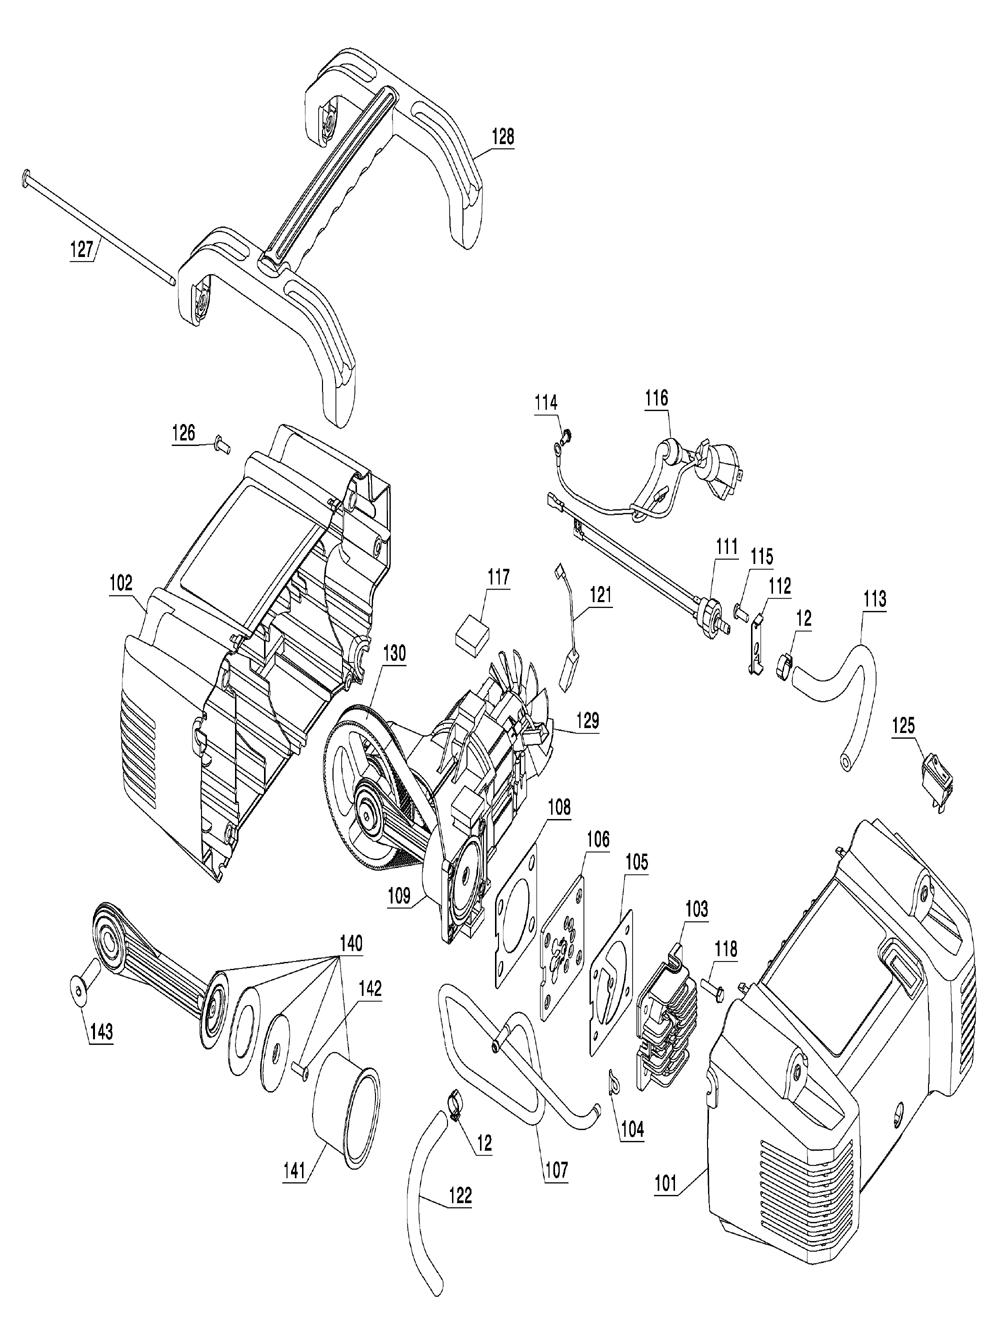 C2002-portercable-T4-PB-1Break Down